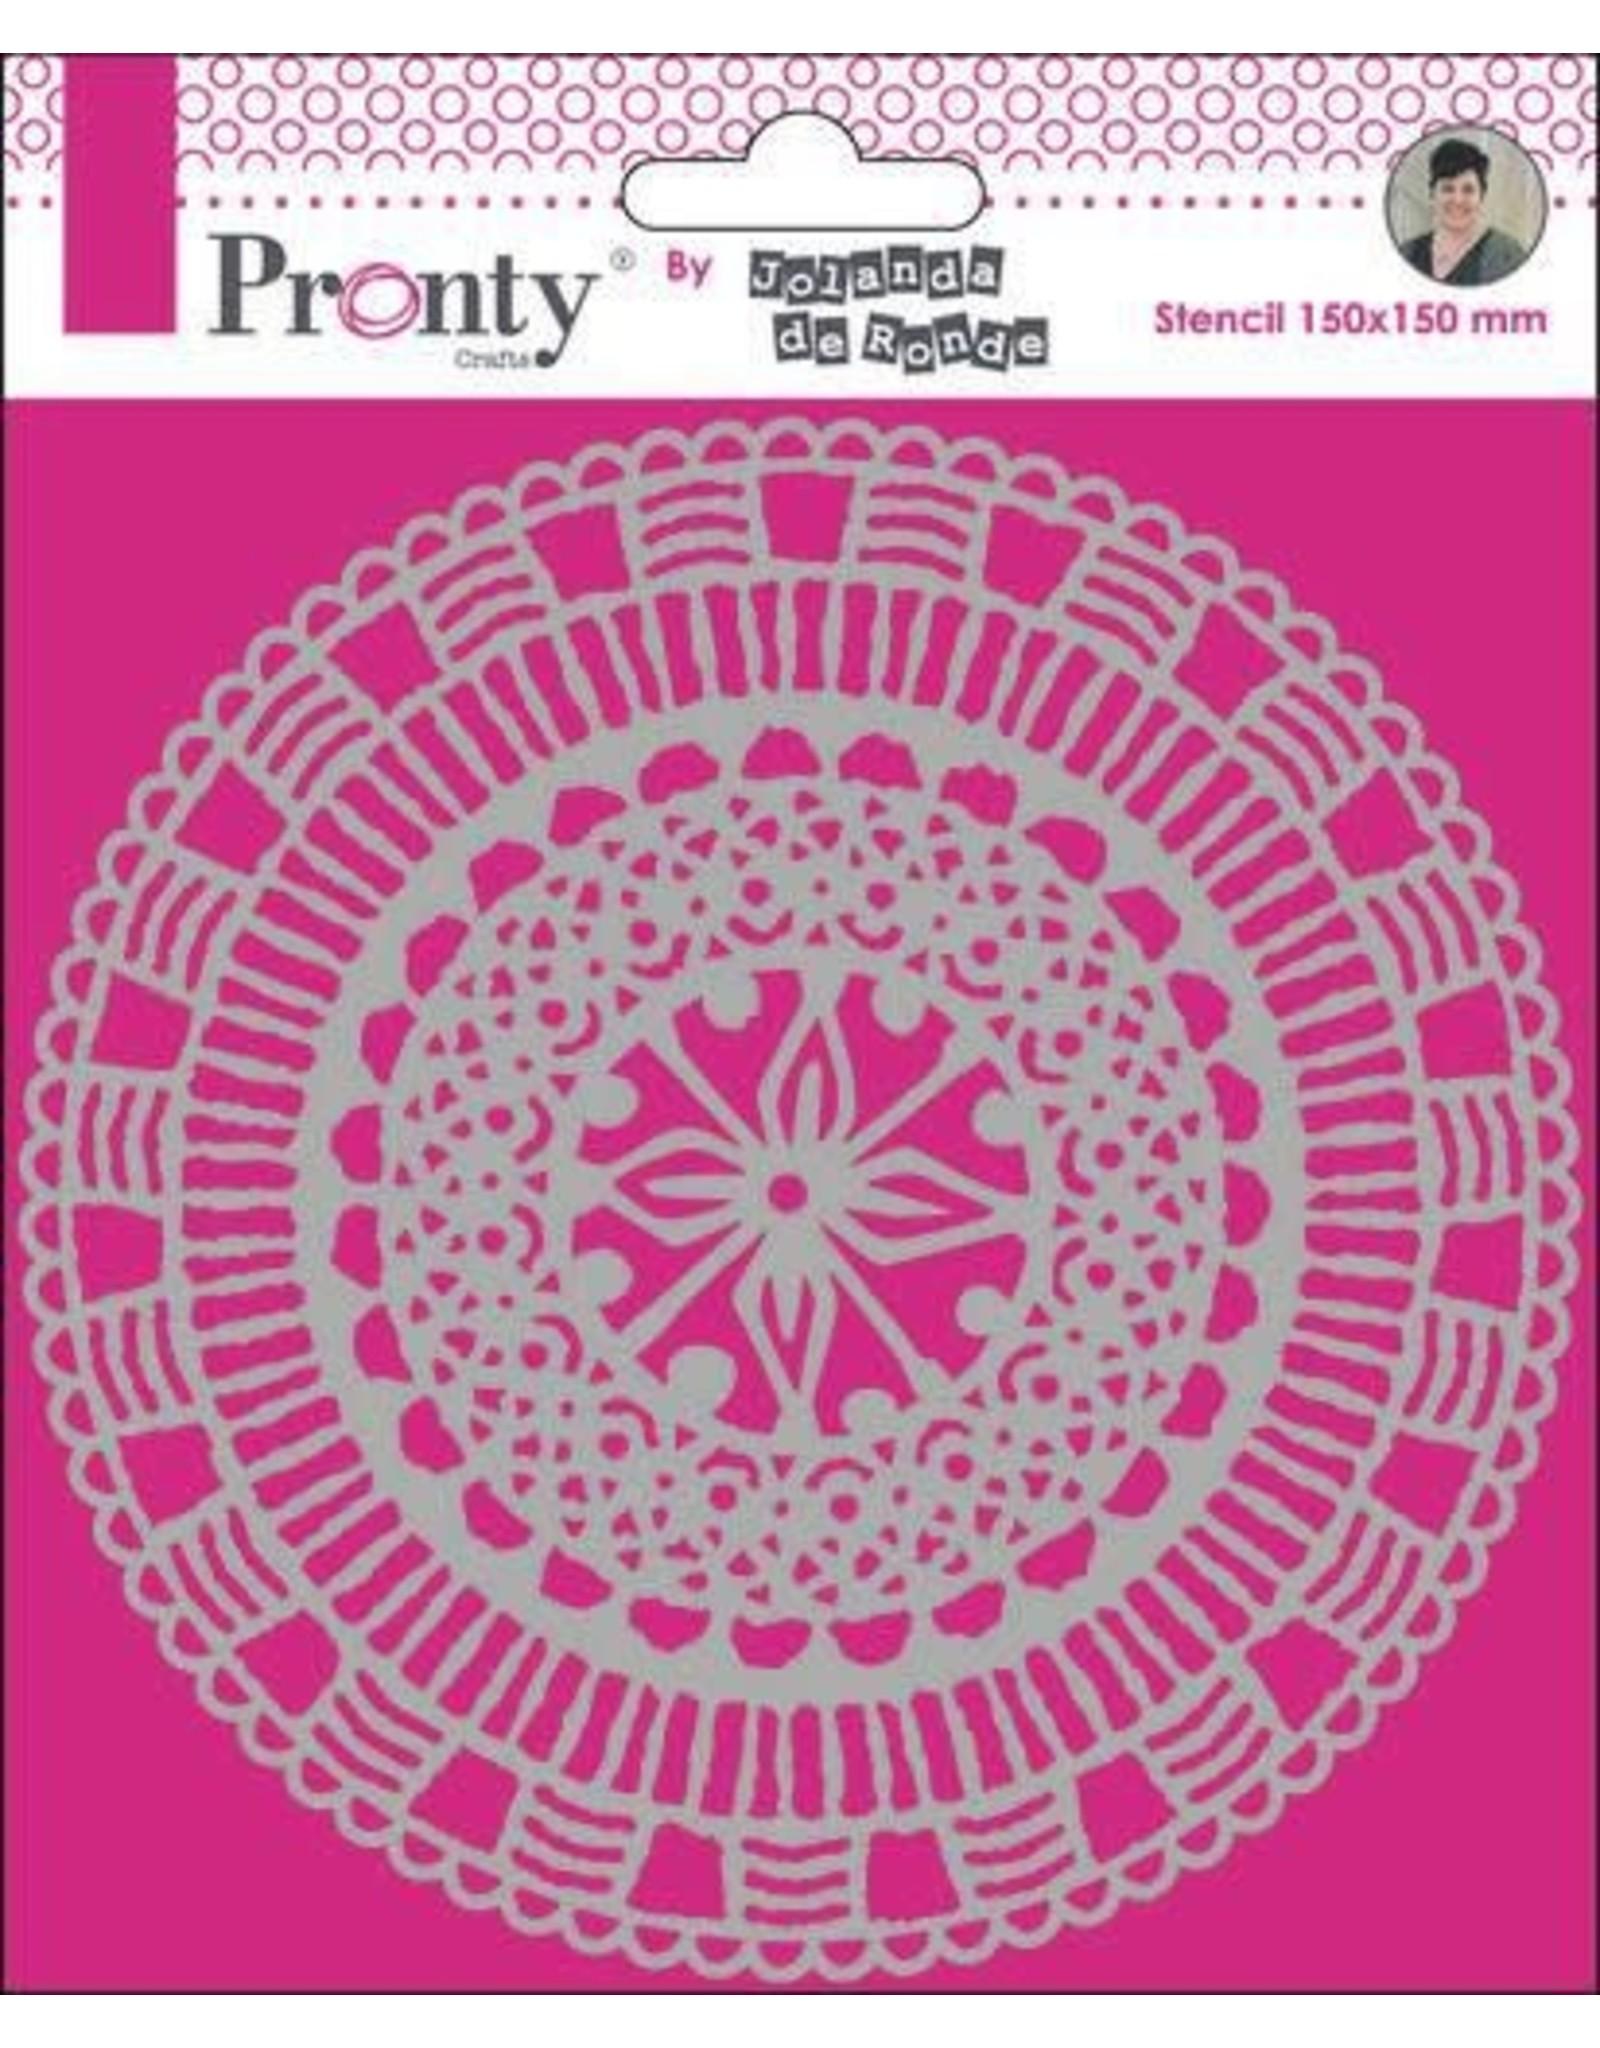 Pronty Pronty Mask Mandala Circle by Jolanda 15x15 470.770.022 by Jolanda